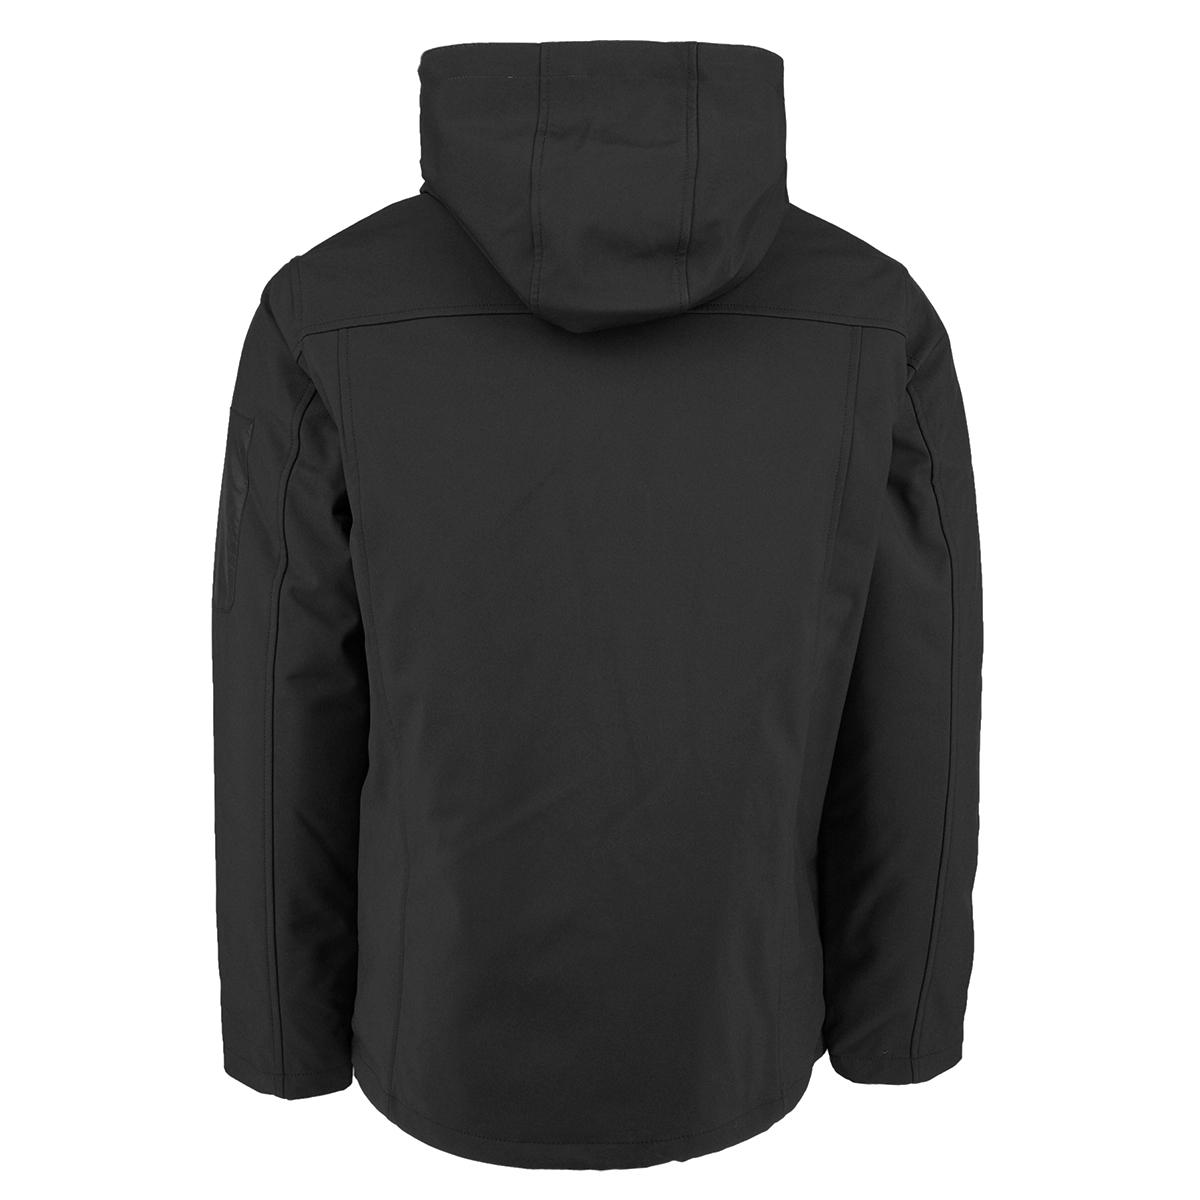 IZOD-Men-039-s-3-in-1-Soft-Shell-Systems-Jacket thumbnail 4